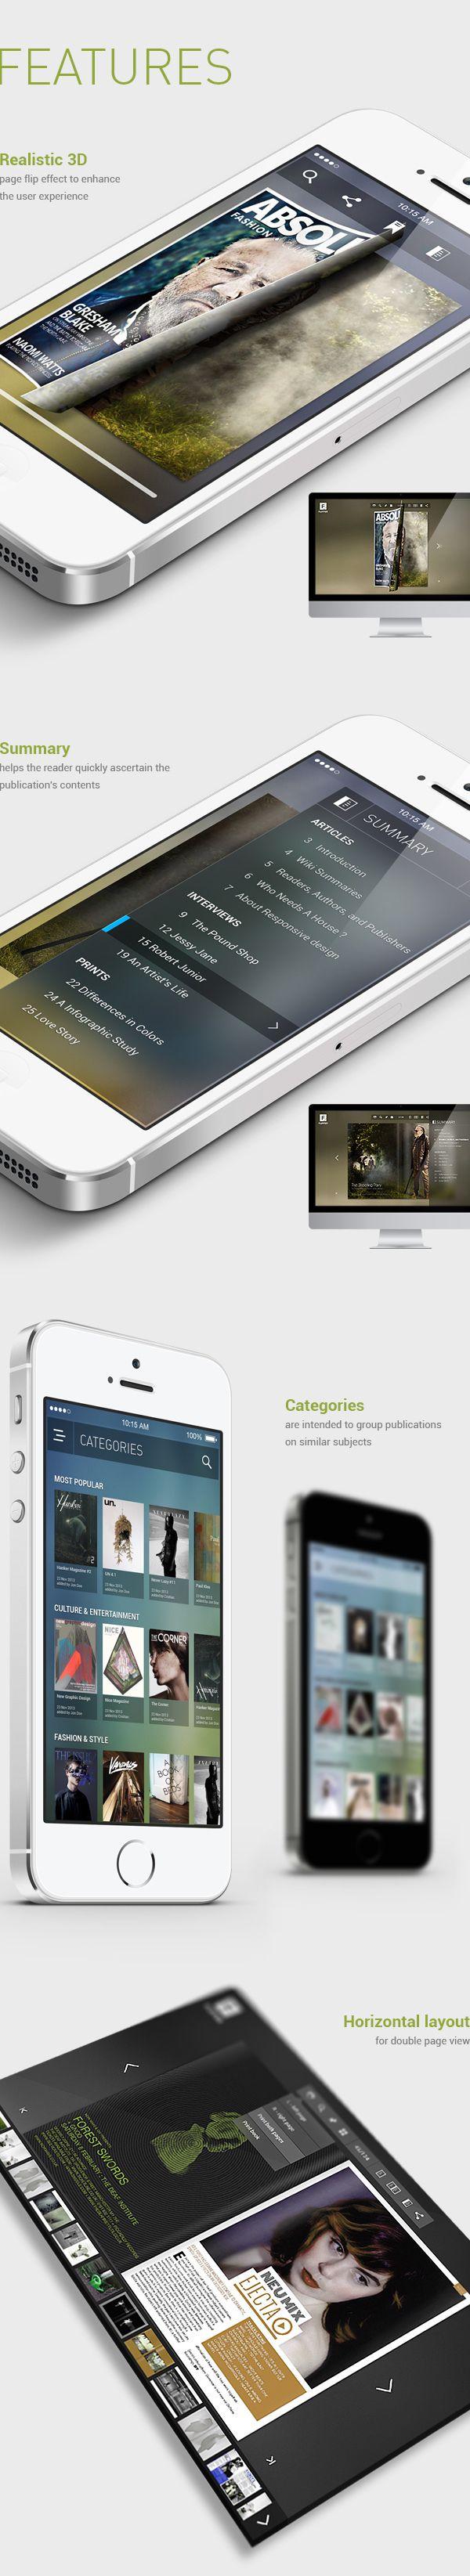 Flipper - digital publications platform